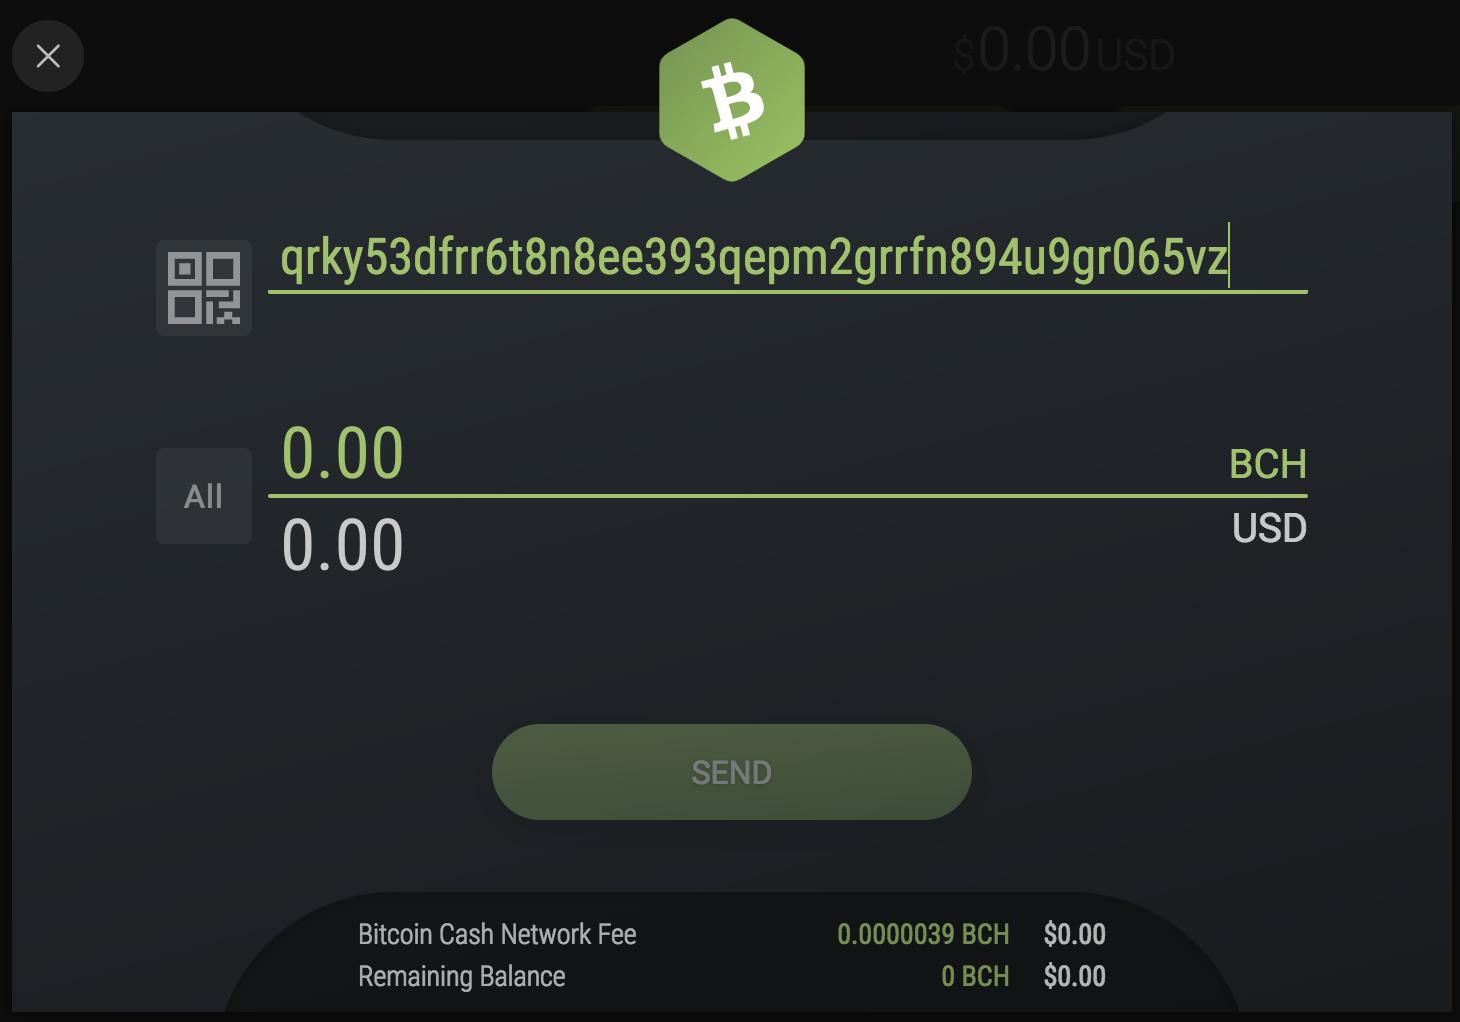 bitcoin cash address format exodus knowledge base